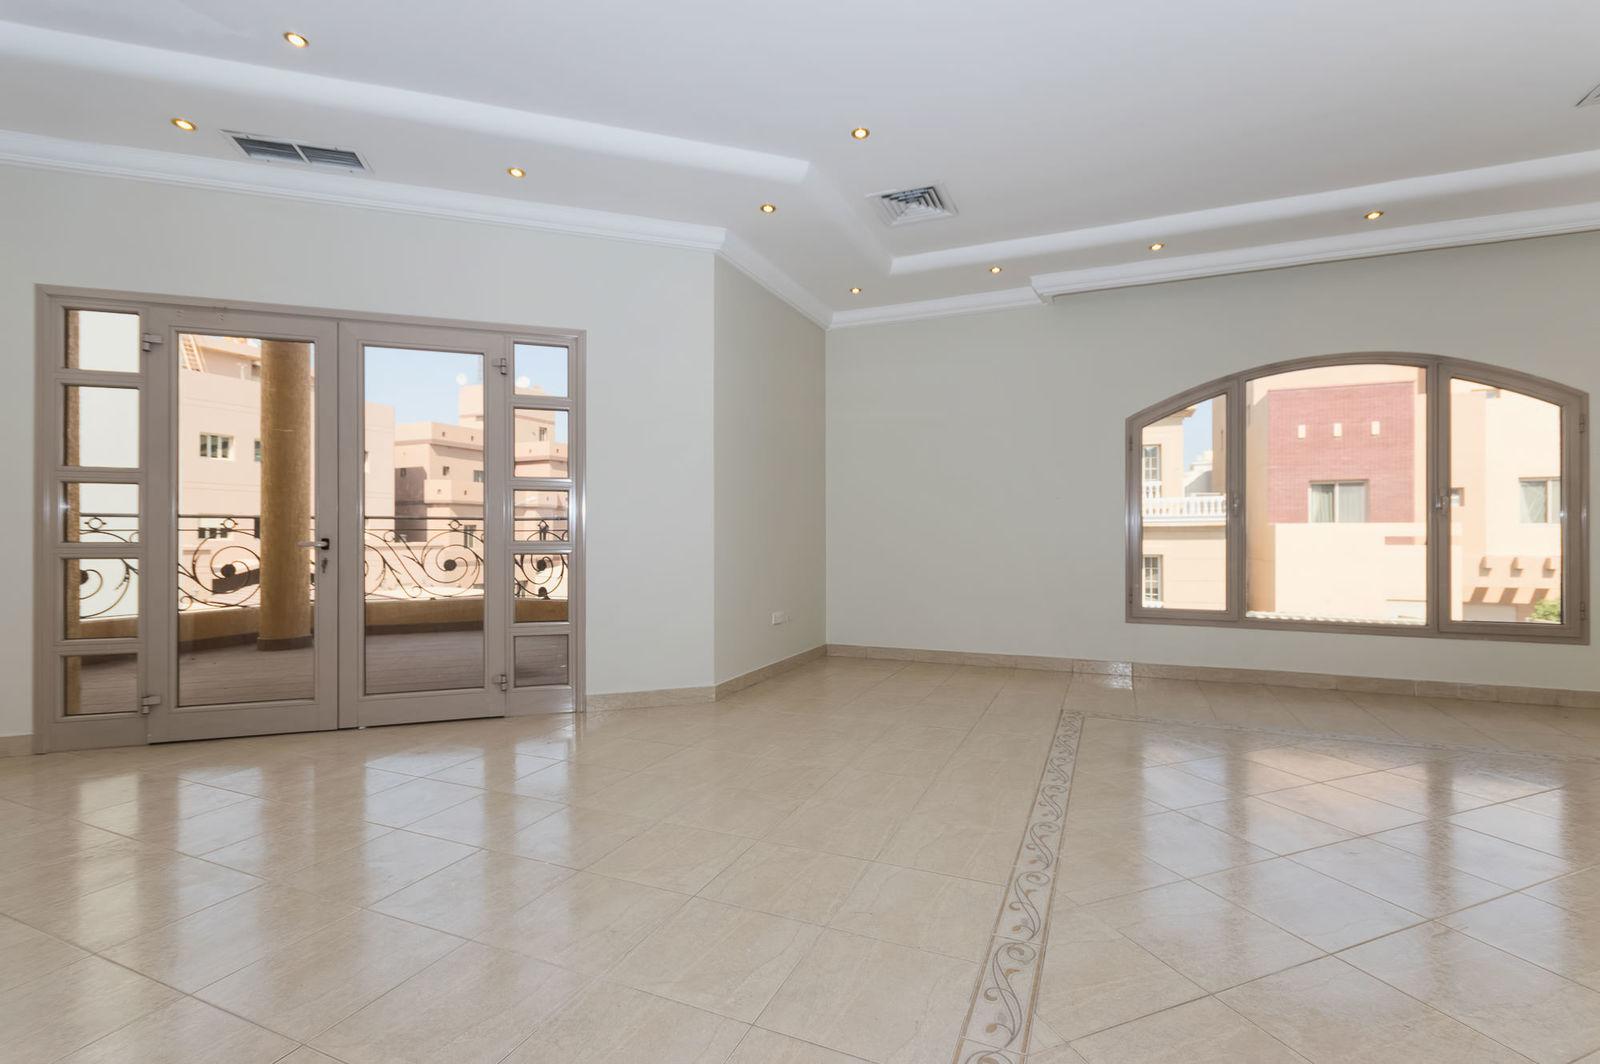 Shuhada – very nice, large, three bedroom floor w/balcony